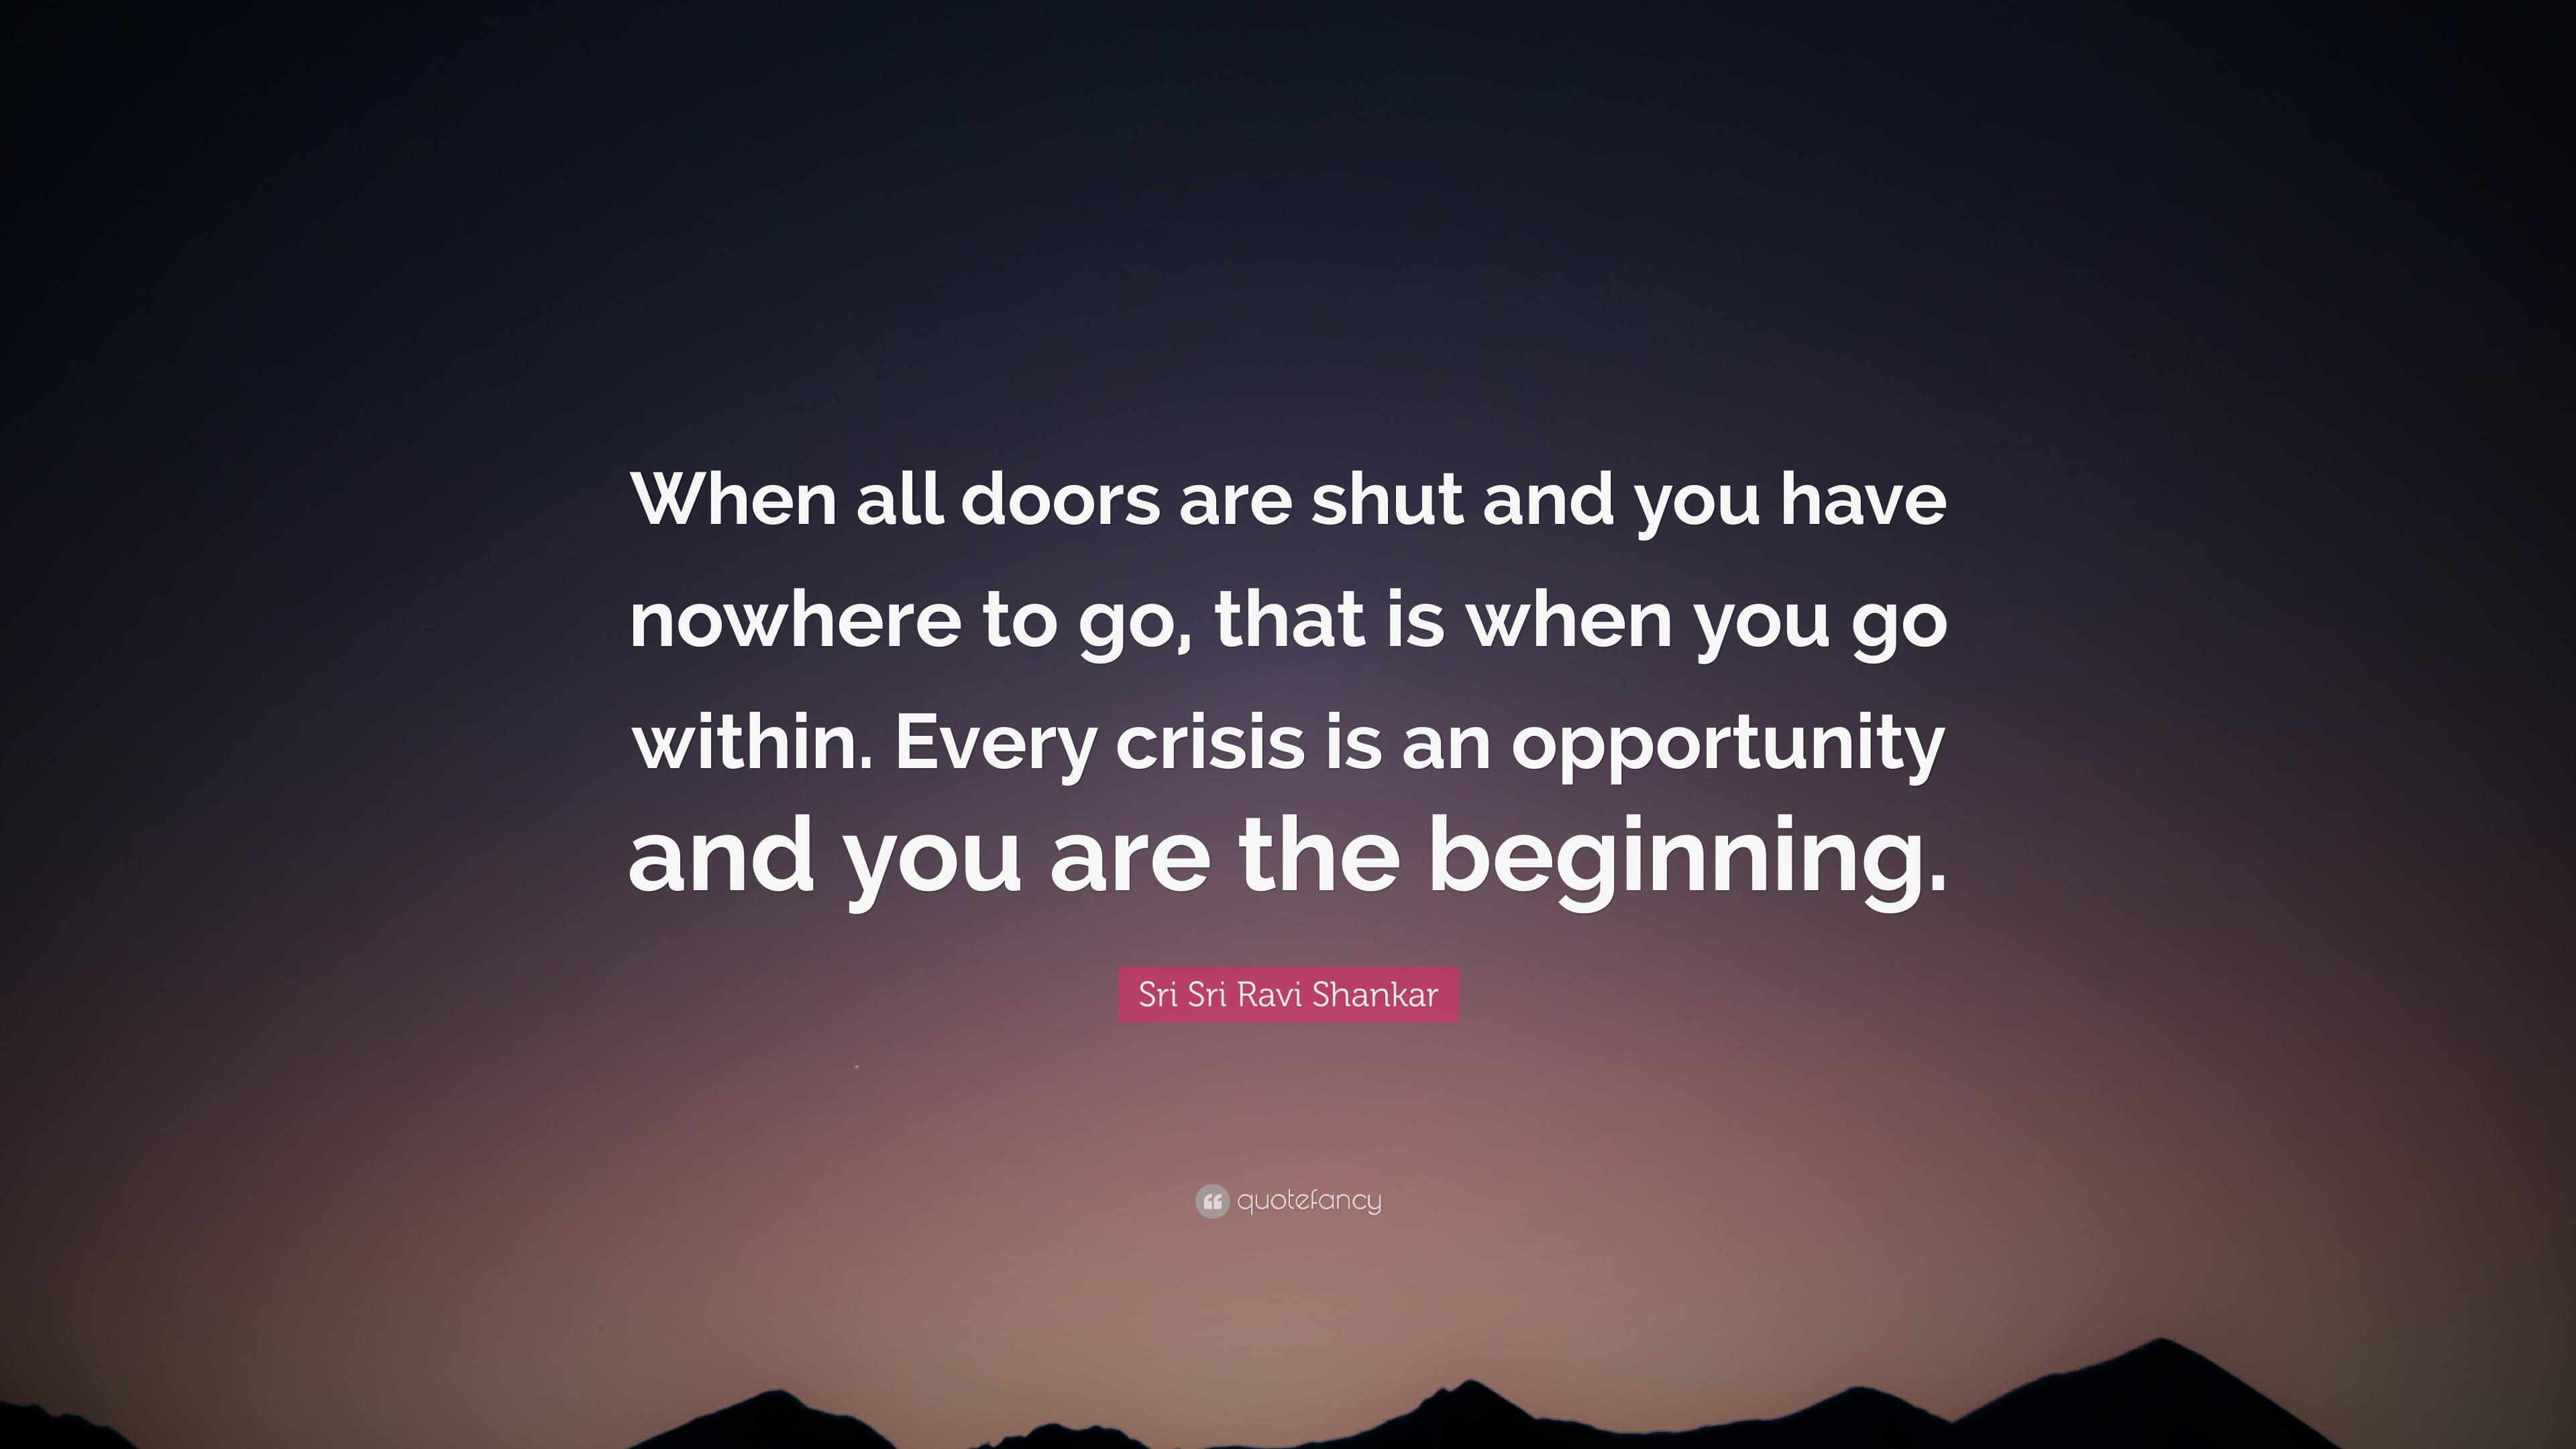 Sri Sri Ravi Shankar Quote \u201cWhen all doors are shut and you have nowhere & Sri Sri Ravi Shankar Quote: \u201cWhen all doors are shut and you have ...